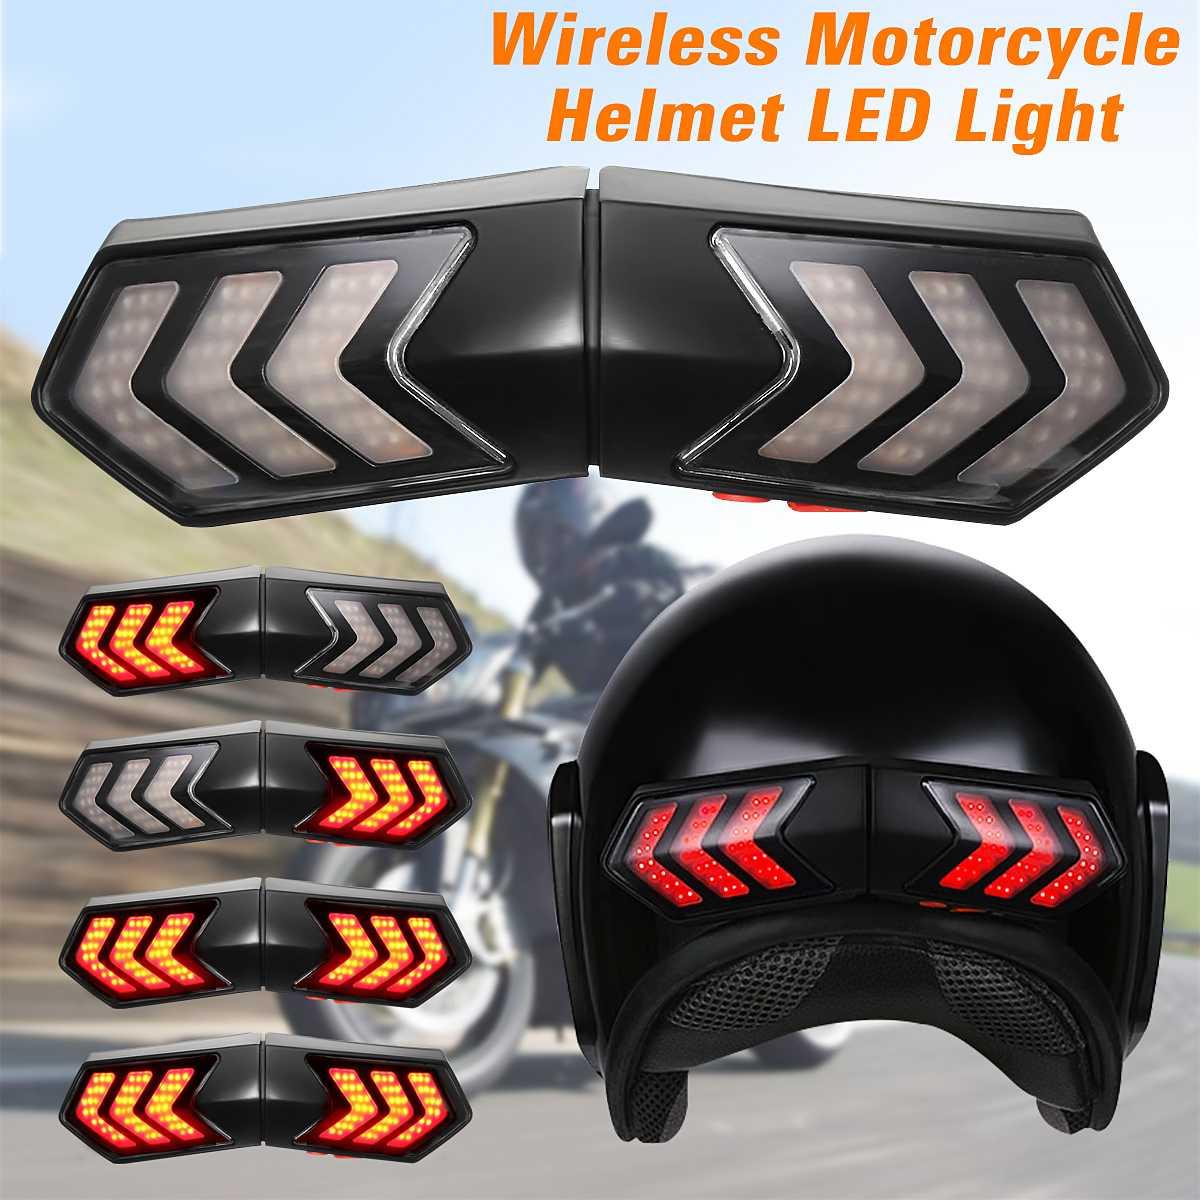 12V Wireless Motorcycle Helmet LED Safety Light Brake Lights Turn Signal Indicators12V Wireless Motorcycle Helmet LED Safety Light Brake Lights Turn Signal Indicators